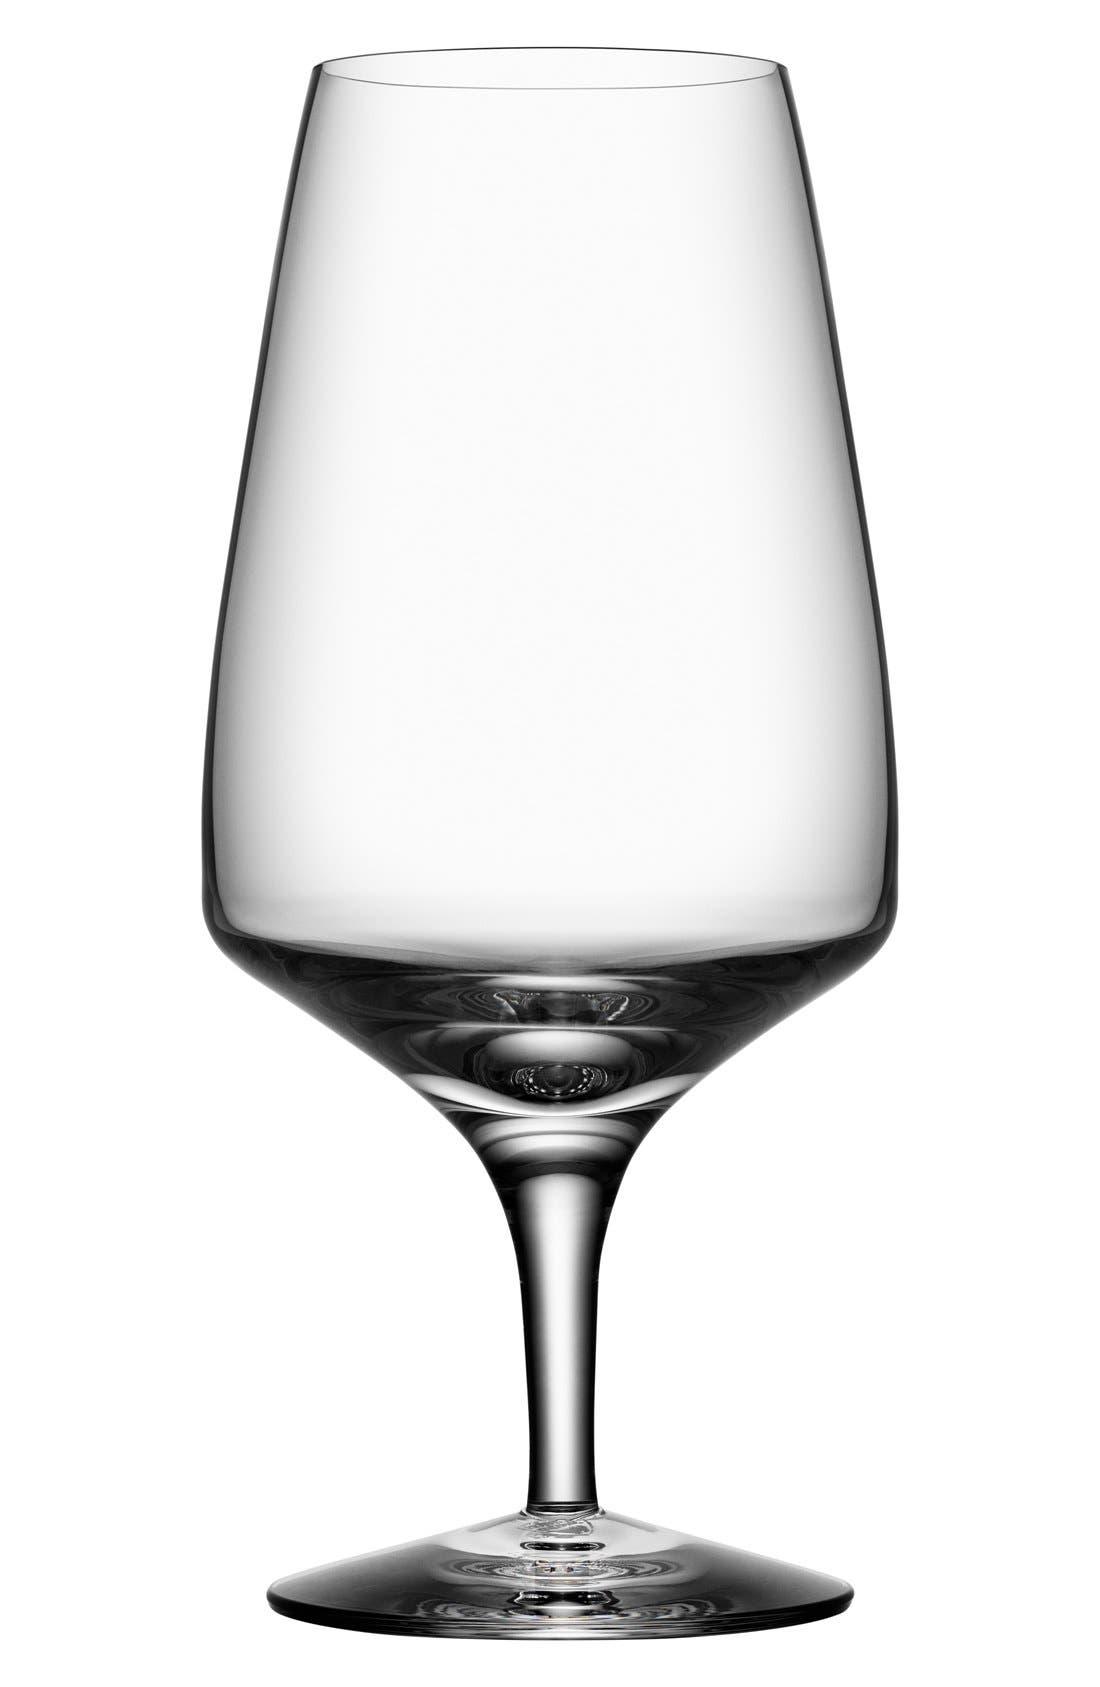 Main Image - Orrefors 'Pulse' Leaded Crystal Beer Glasses (Set of 4)